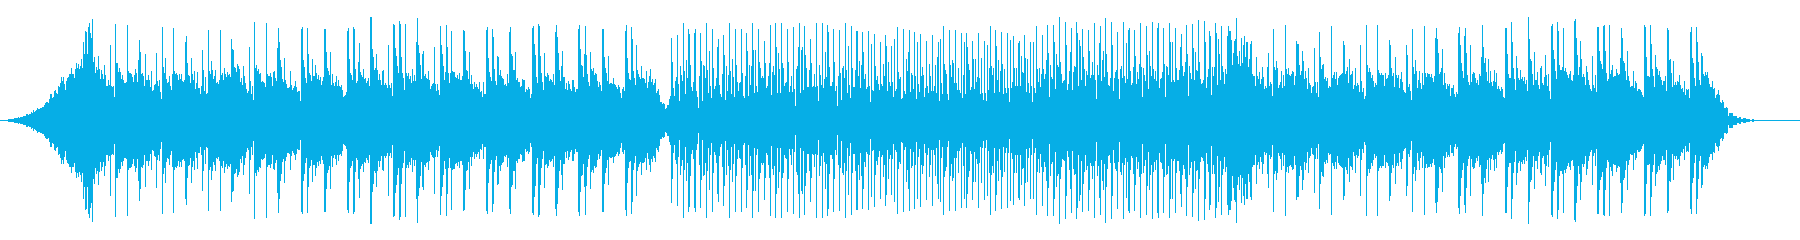 NewAge・エレクトロ・劇伴の再生済みの波形